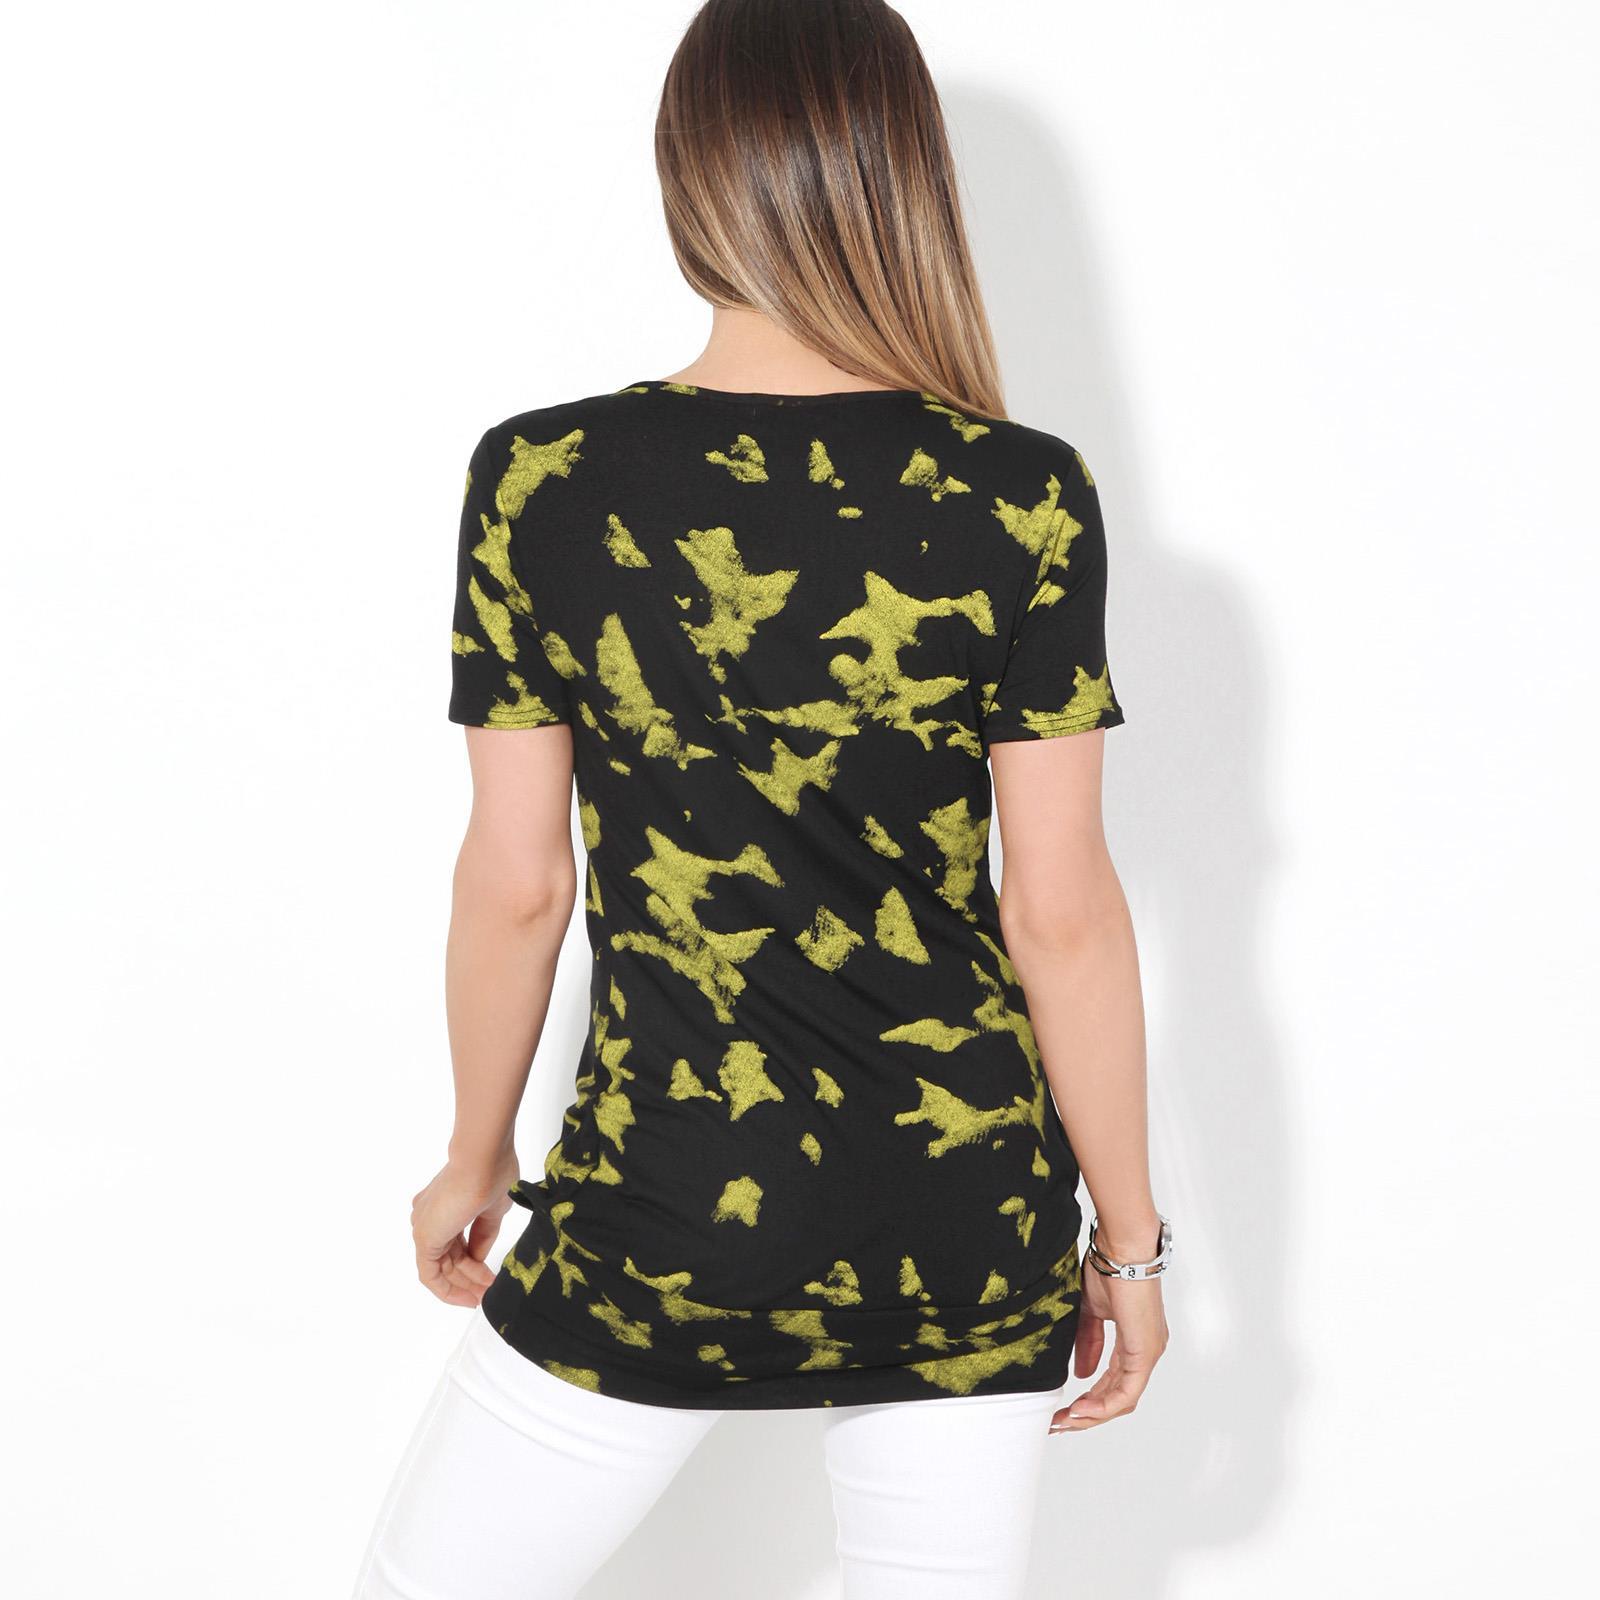 Womens-Ladies-Pattern-T-Shirt-Camo-Print-Blouse-Scoop-Neck-Baggy-Long-Top-Tunic thumbnail 11